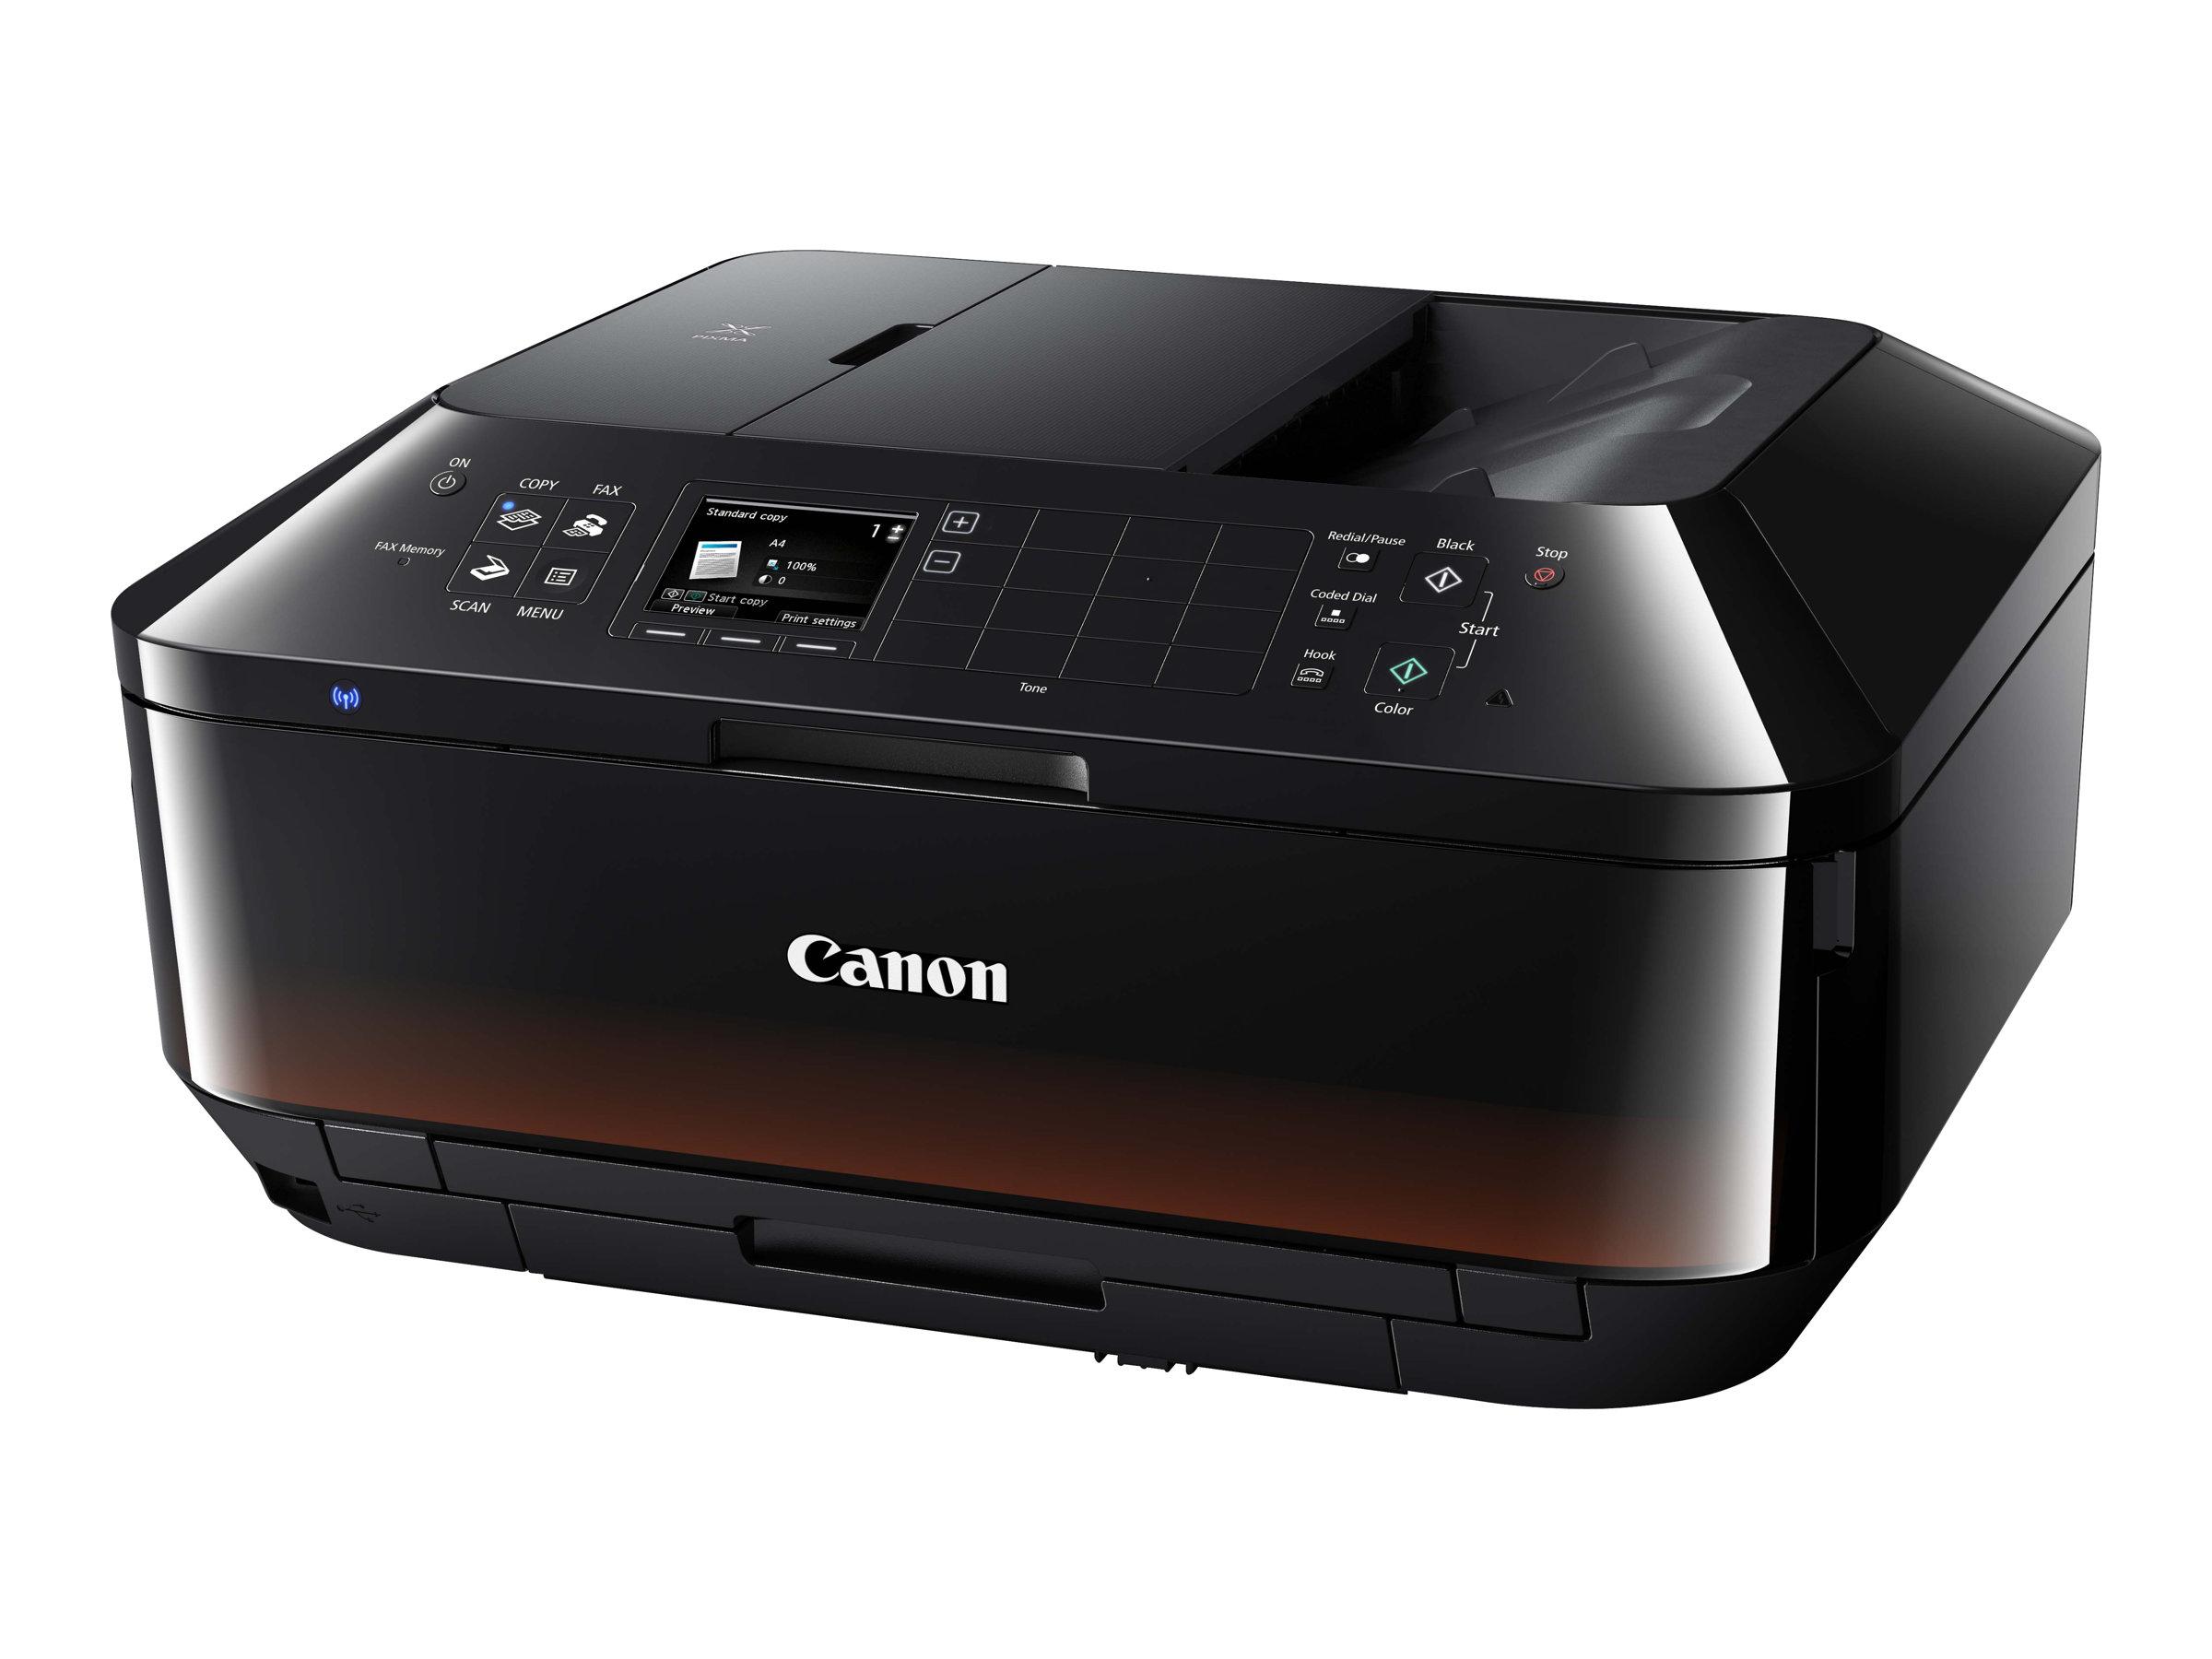 Canon PIXMA MX925 - Multifunktionsdrucker - Farbe - Tintenstrahl - A4 (210 x 297 mm)